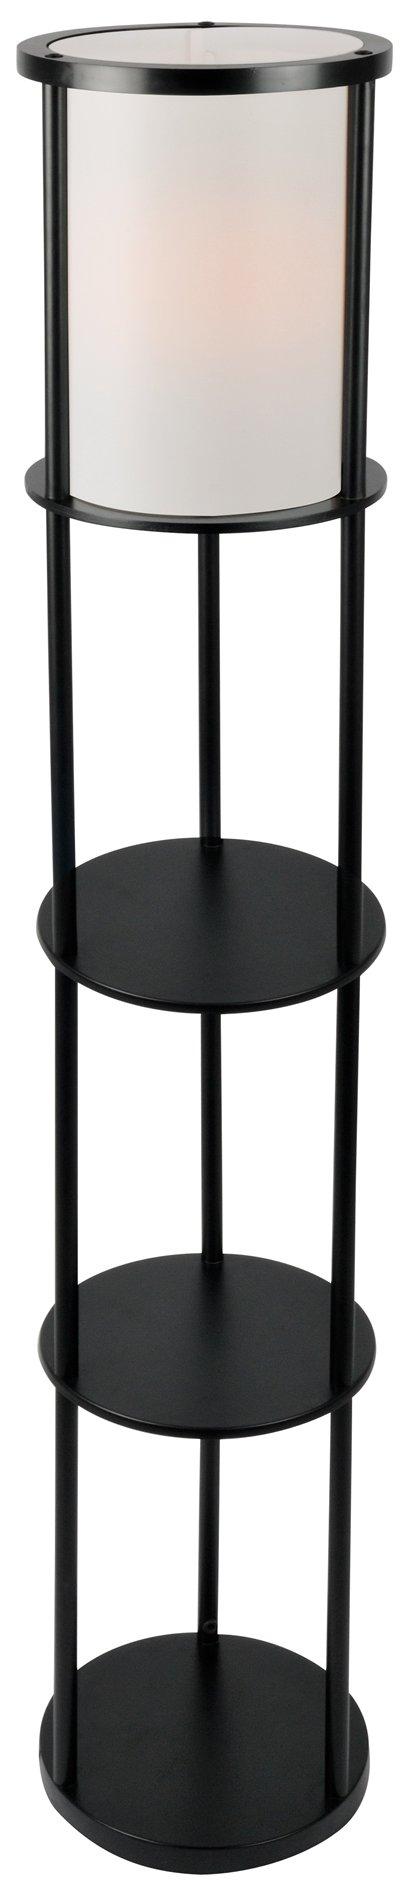 Lite source ls 82839blk laina transitional 3 tier shelf for 4 tier floor lamp